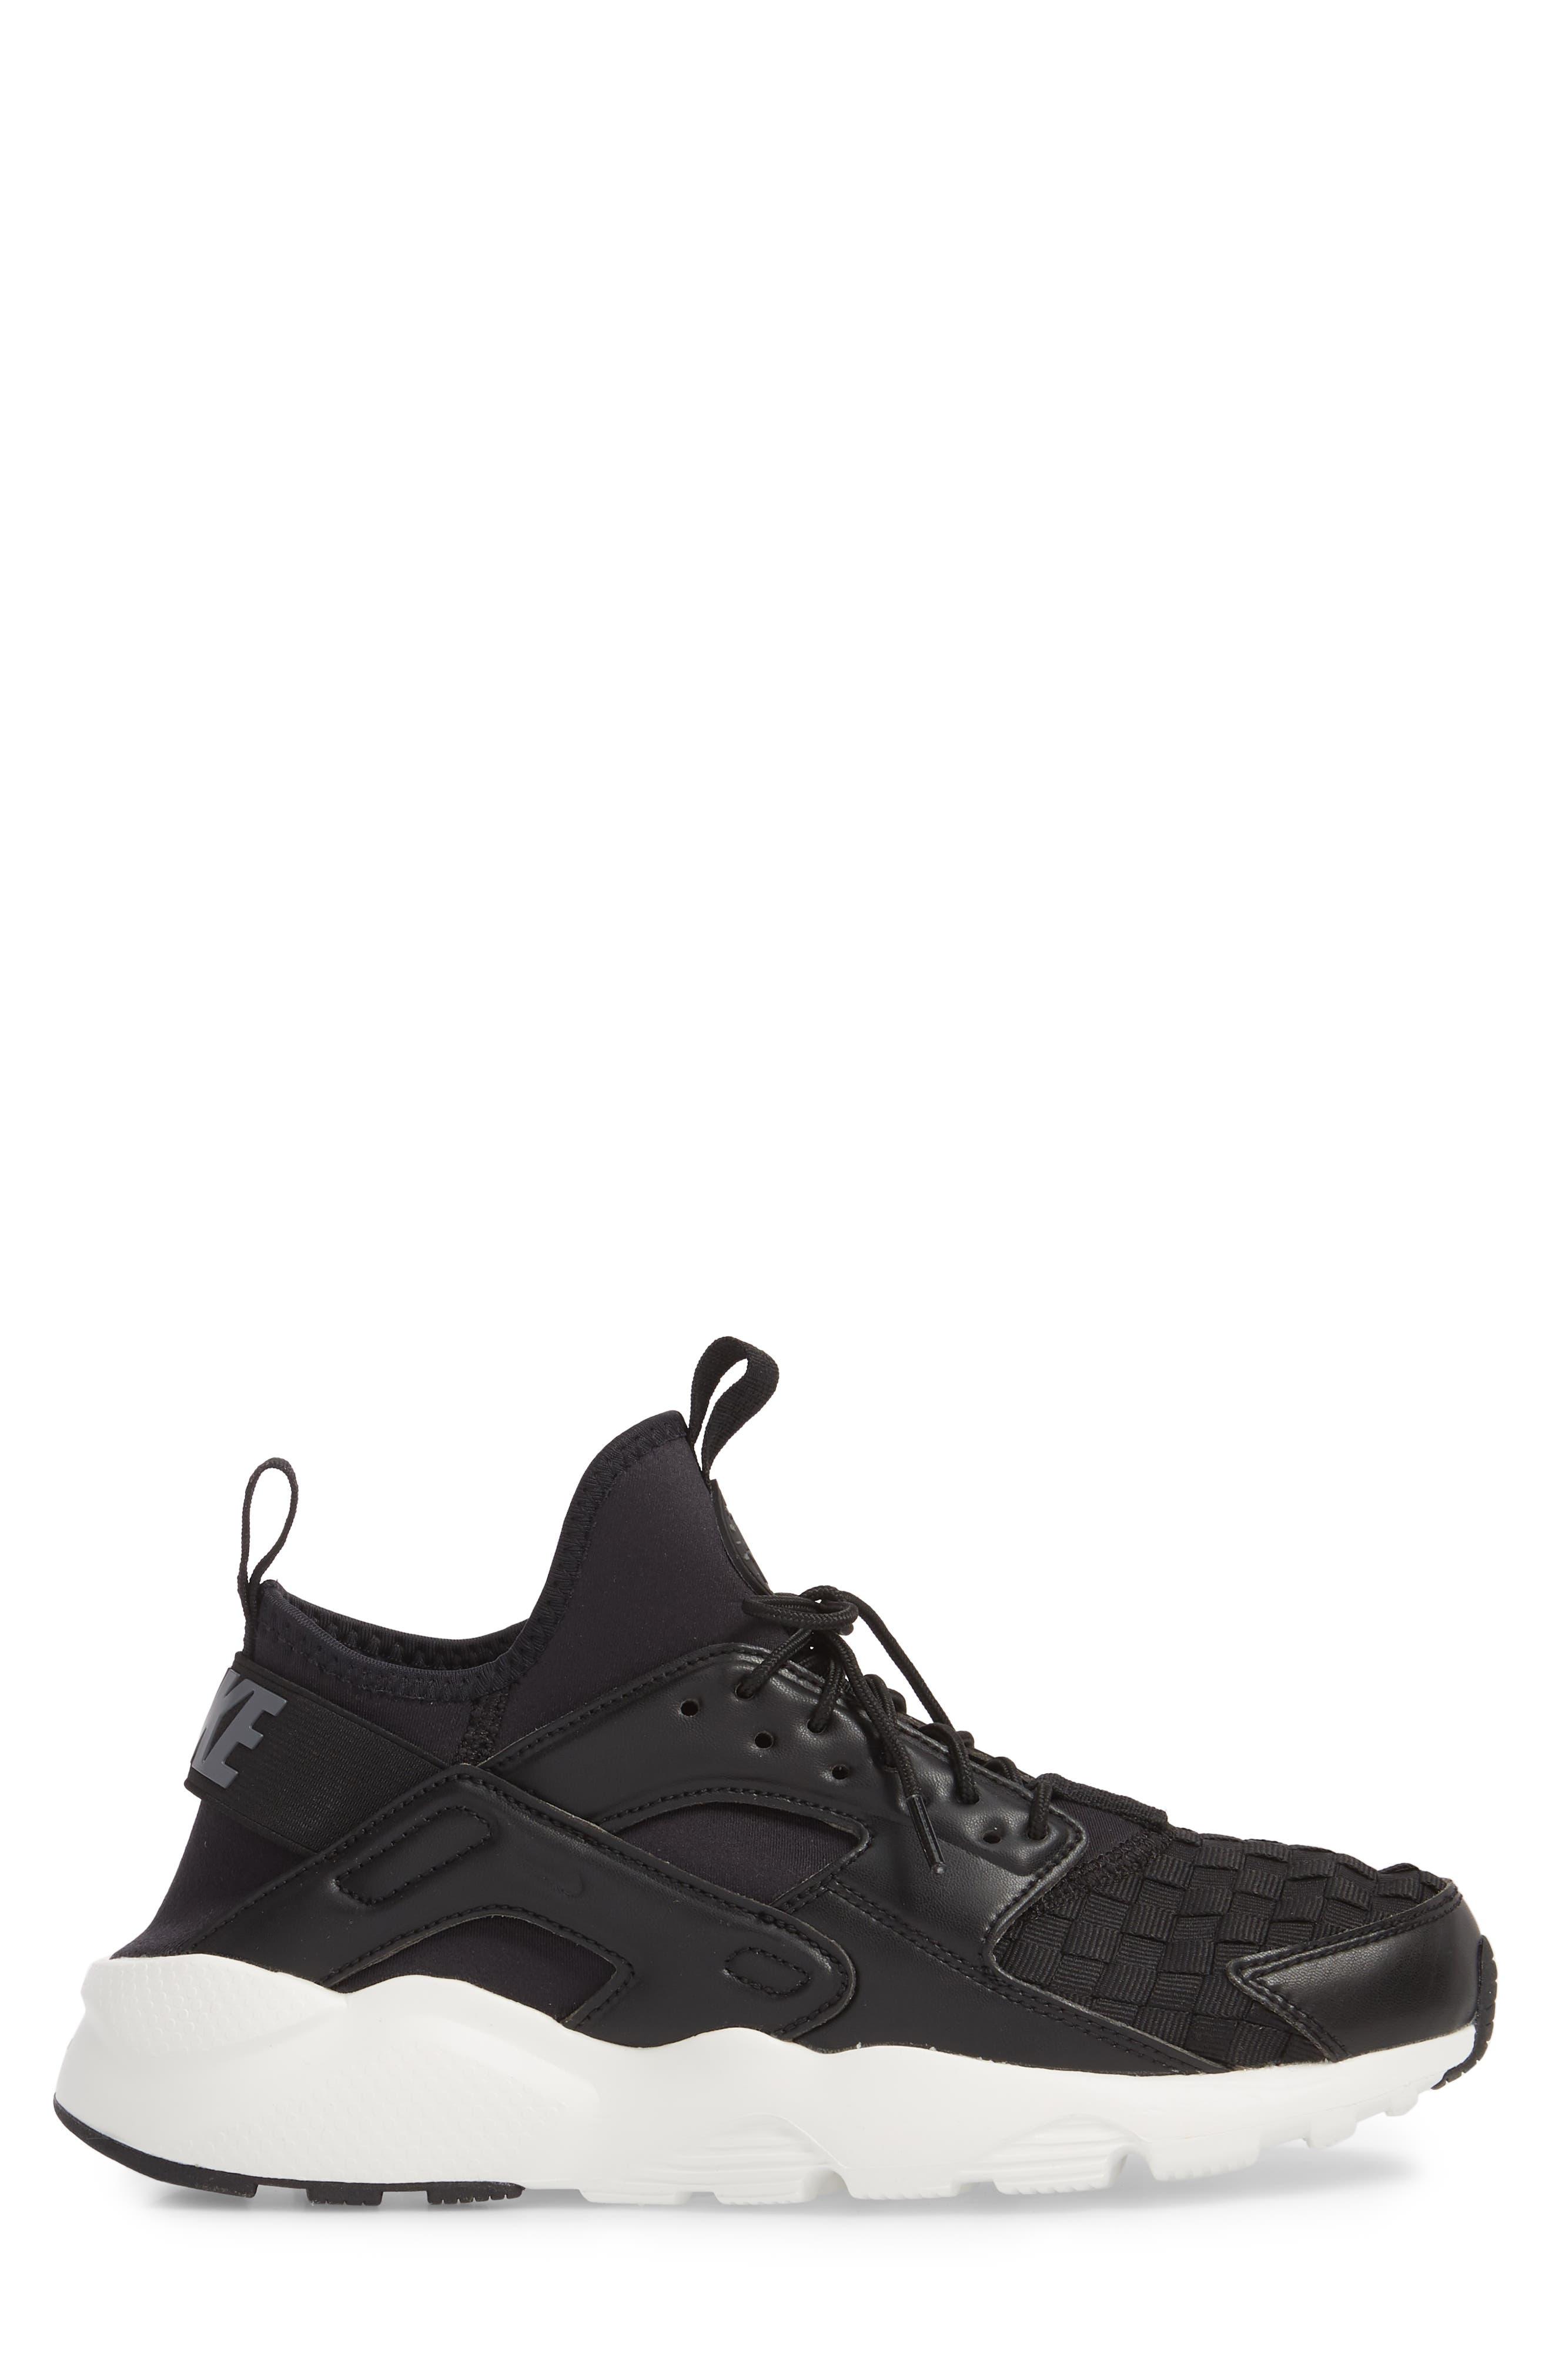 Alternate Image 3  - Nike Air Huarache Run Ultra SE Sneaker (Men)